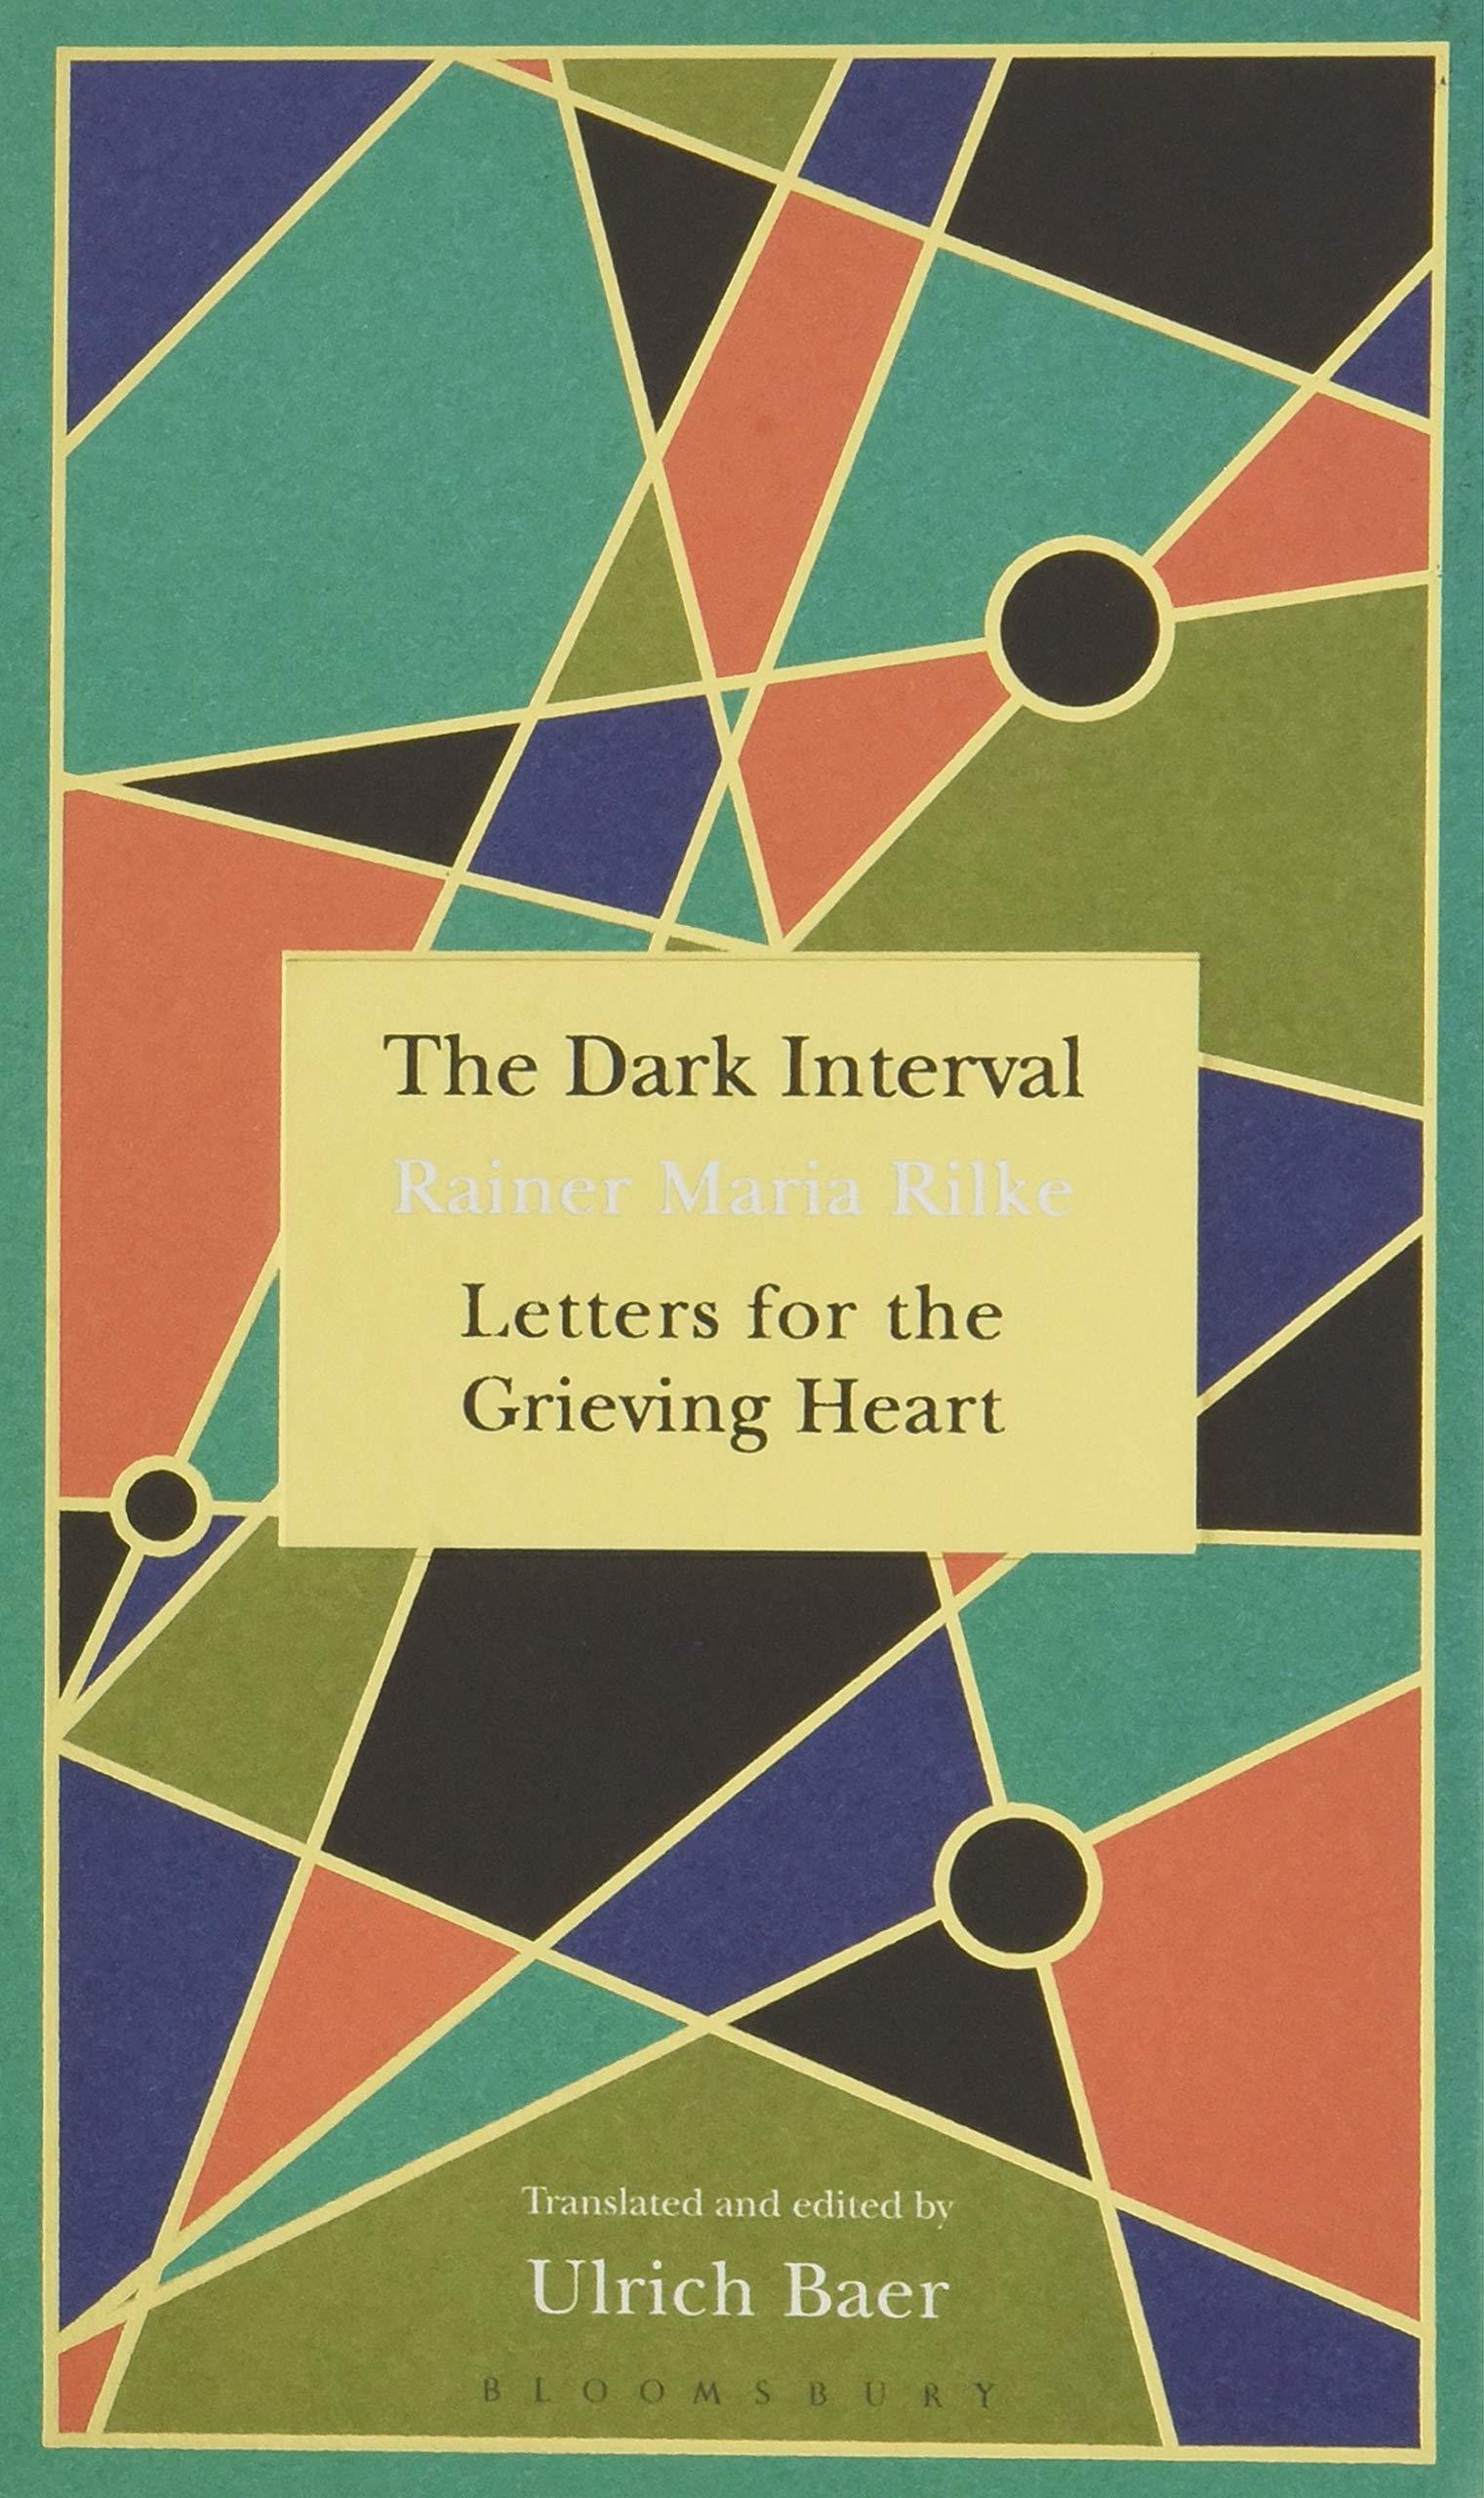 The Dark Interval: Letters for the Grieving Heart: Amazon.co.uk: Rainer  Maria Rilke, Ulrich Baer: 9781526602985: Books